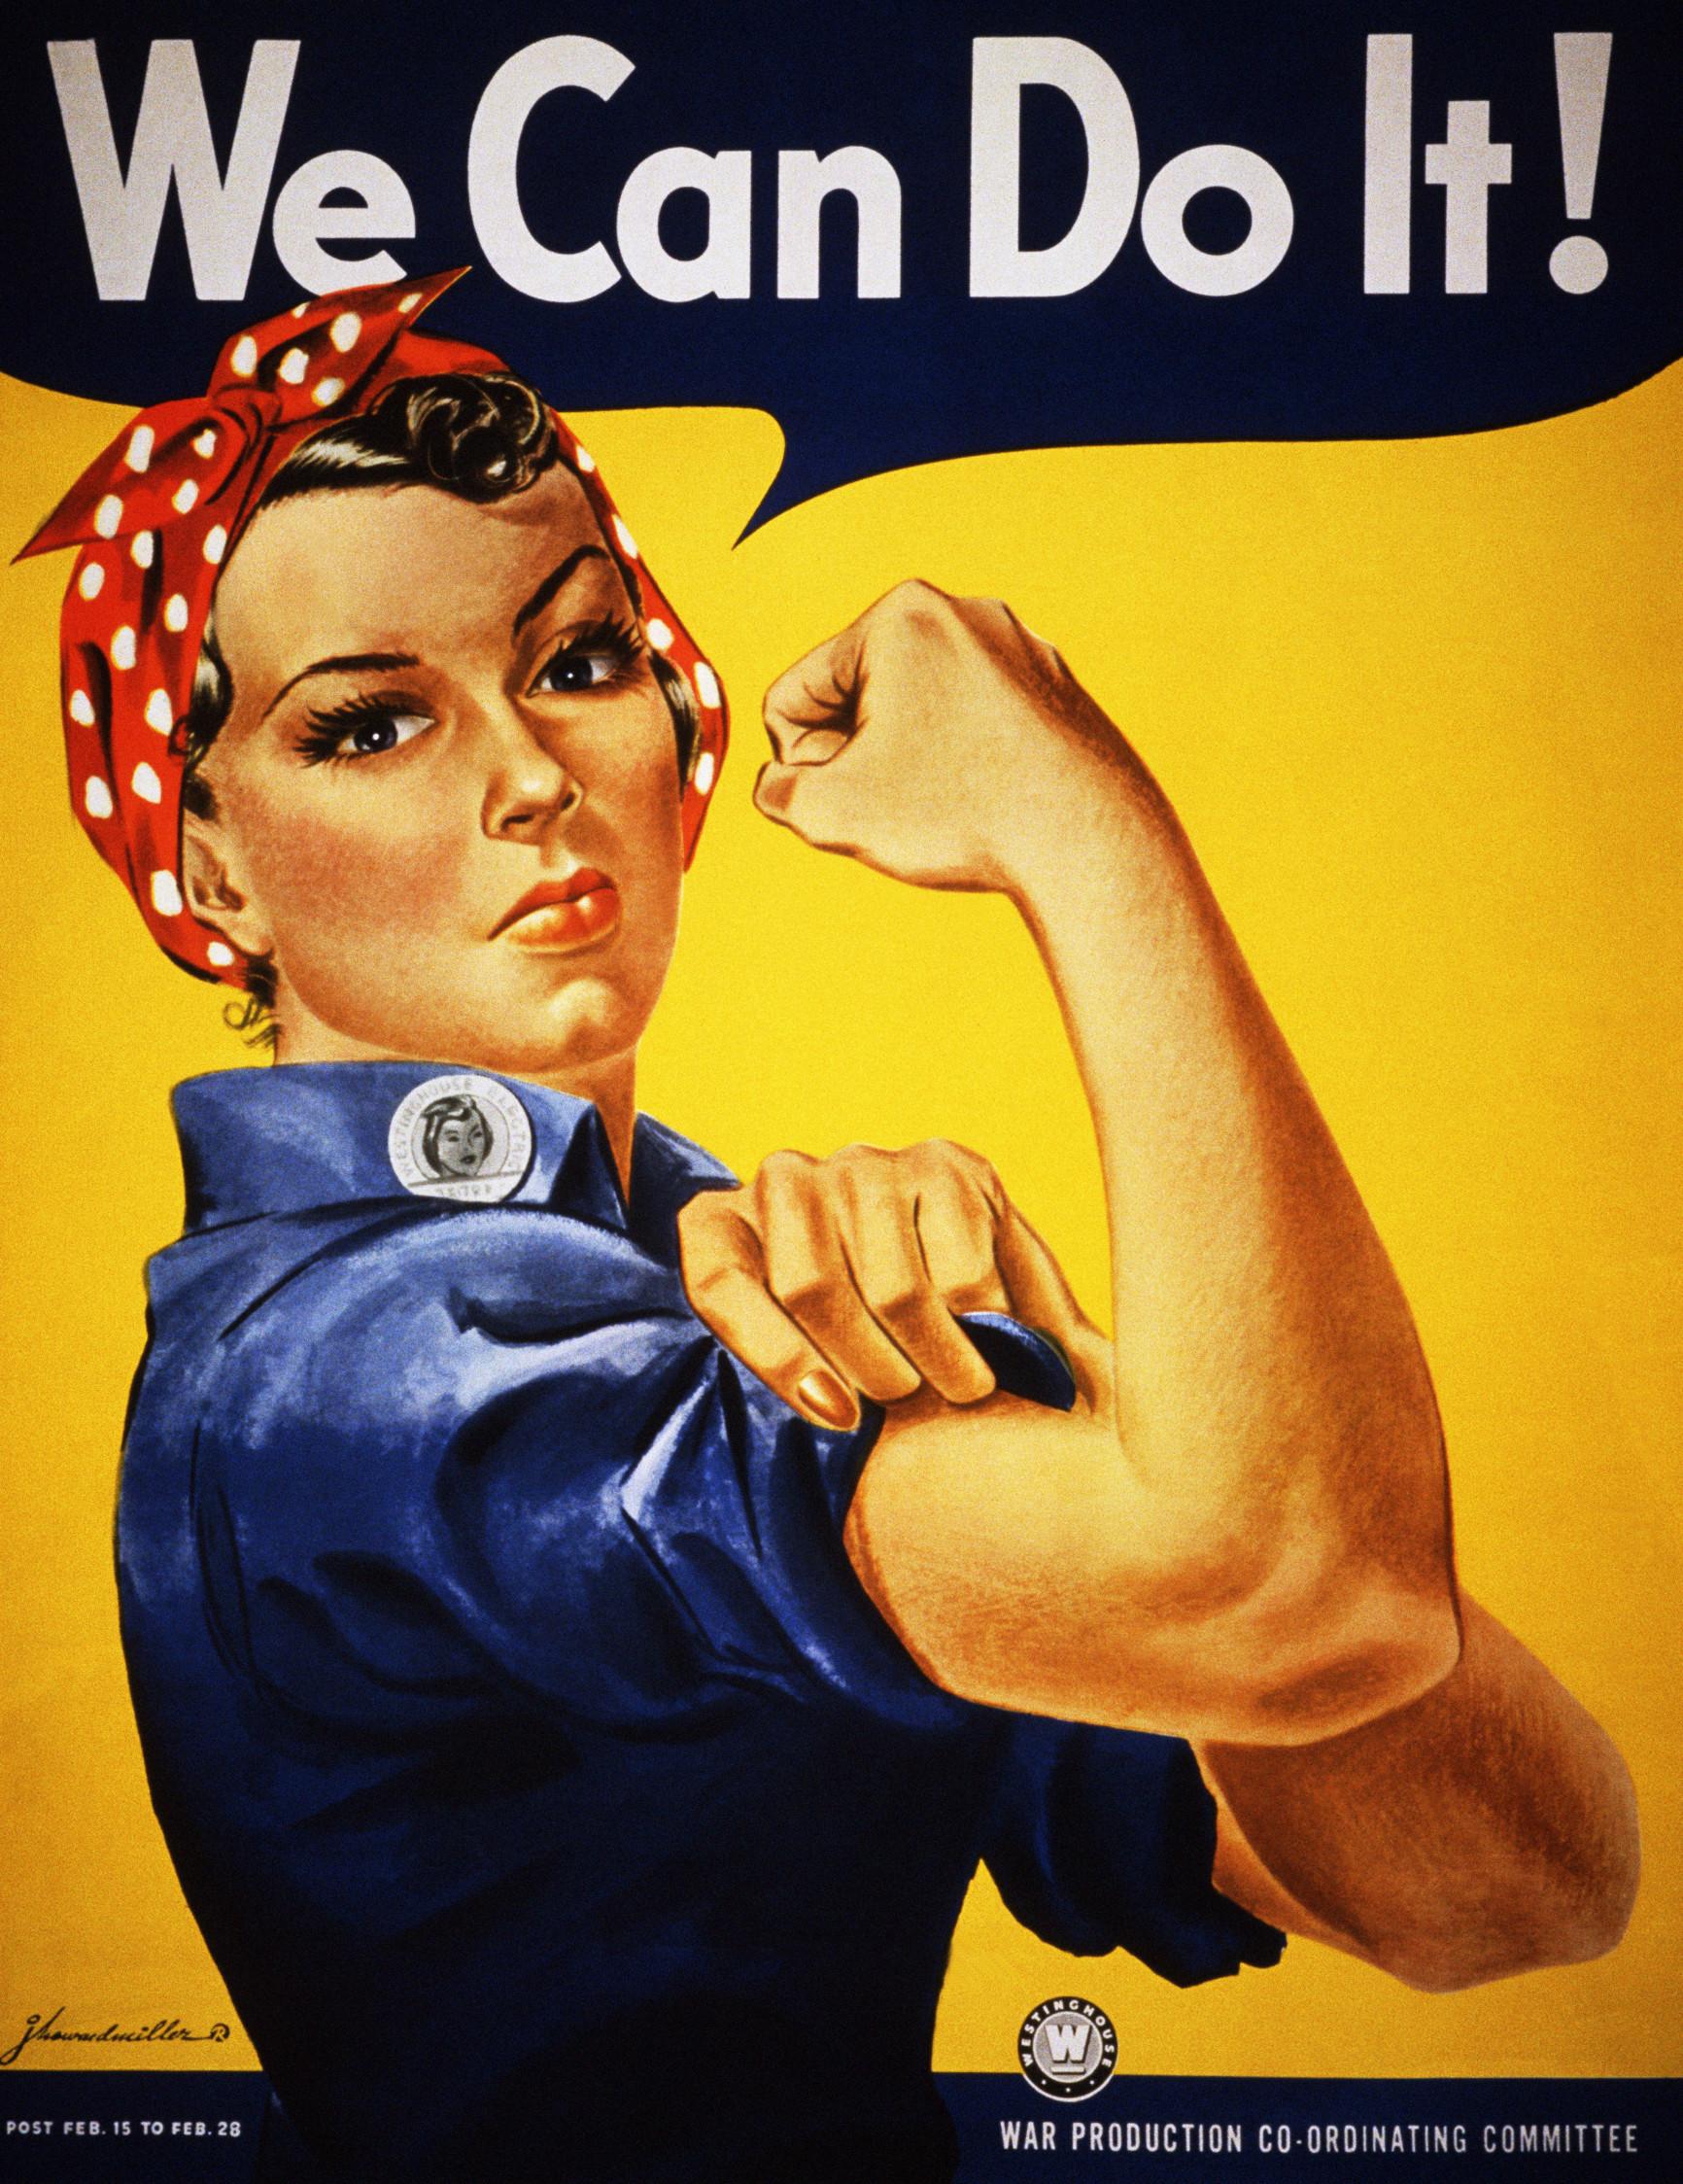 World War II Posters Pictures - World War II History - HISTORY.com